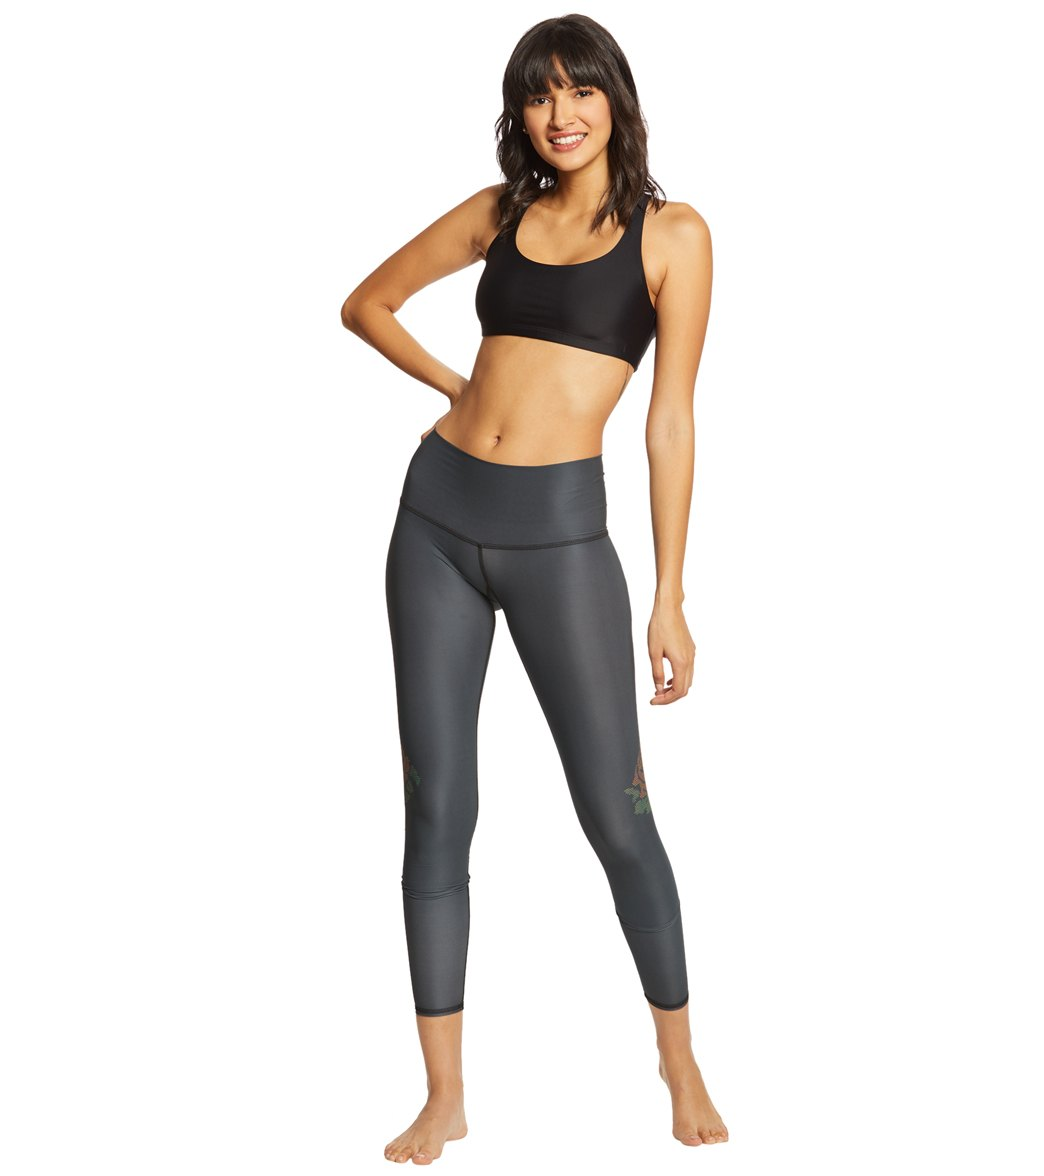 a936c8a066f Teeki Gypsy Rose Hot Yoga Pants at YogaOutlet.com - Free Shipping